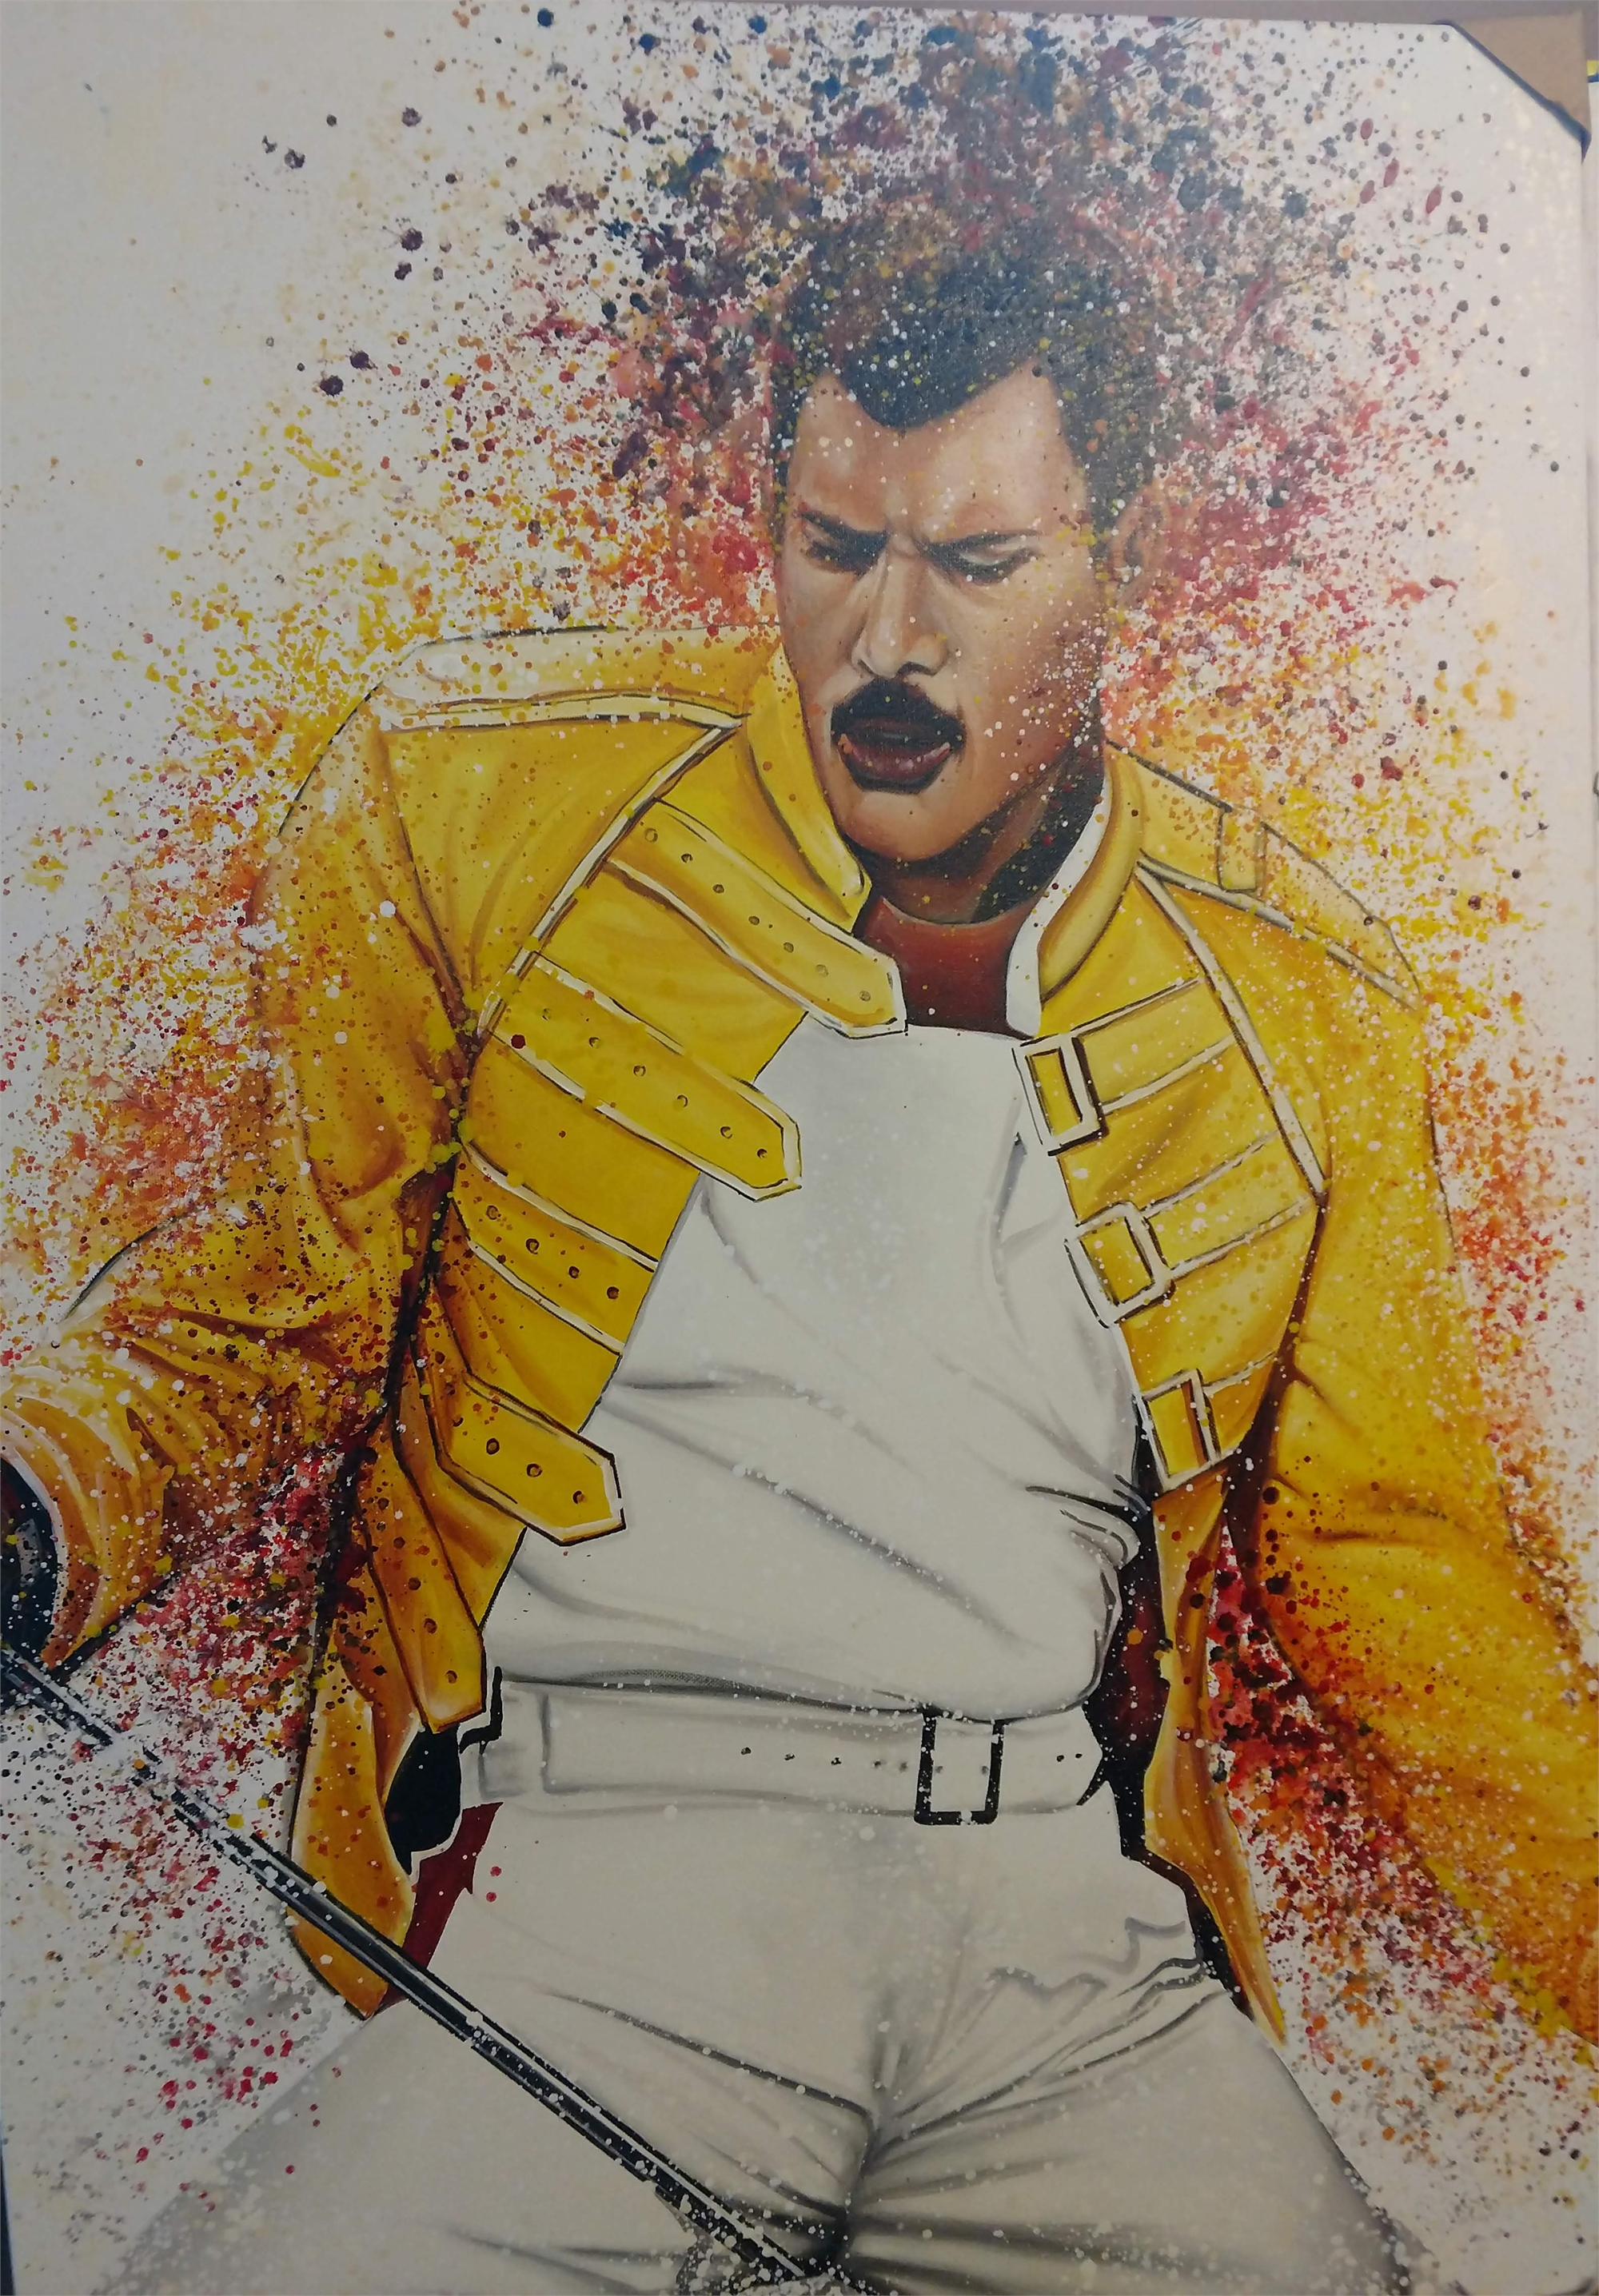 """Freddie At Wembley"" by Buma Project"